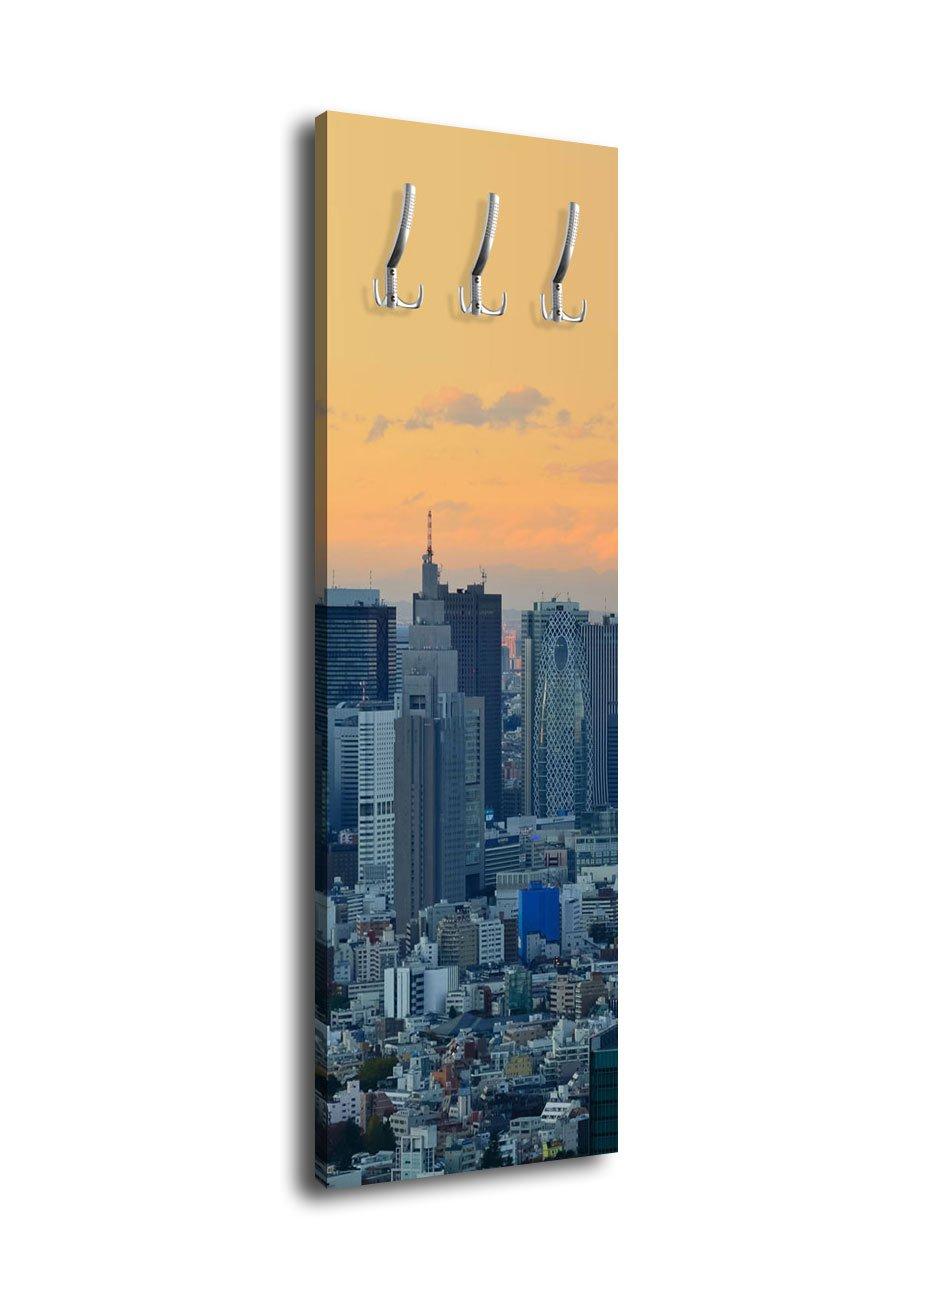 wandmotiv24 Perchero con diseño Tokyo Skyline Shin juku G394 ...